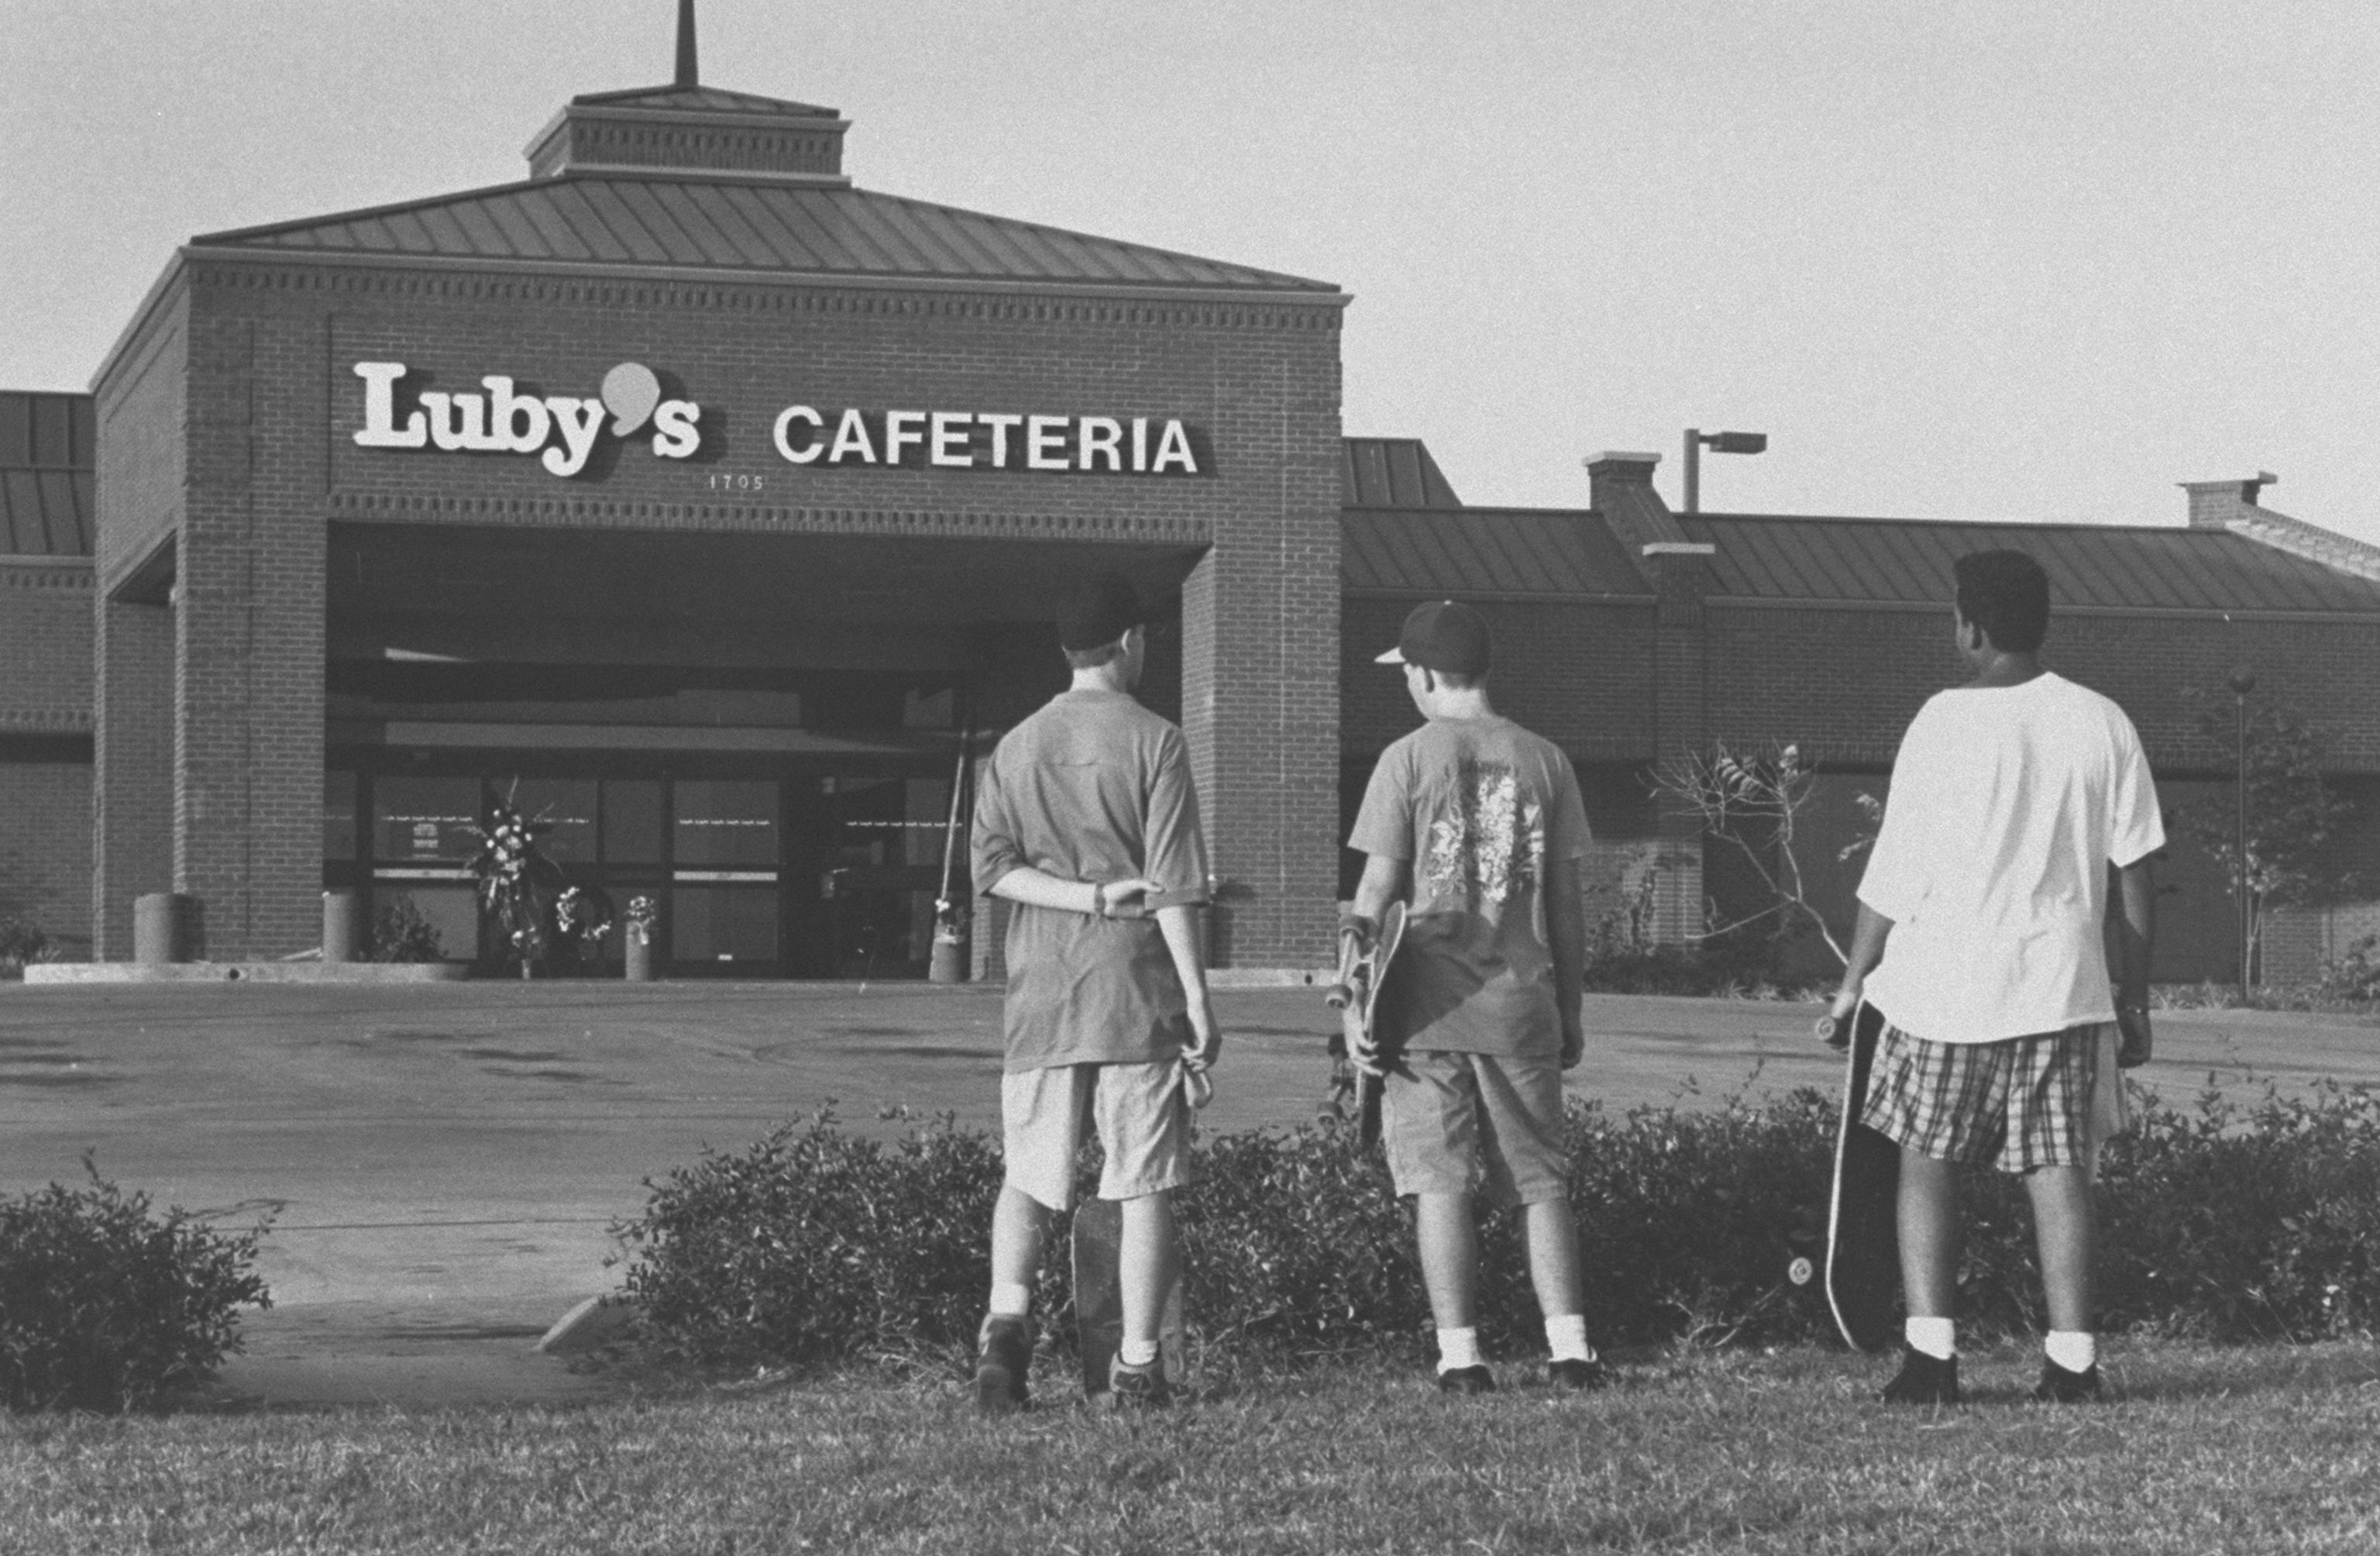 Masacre de Luby's Cafeteria